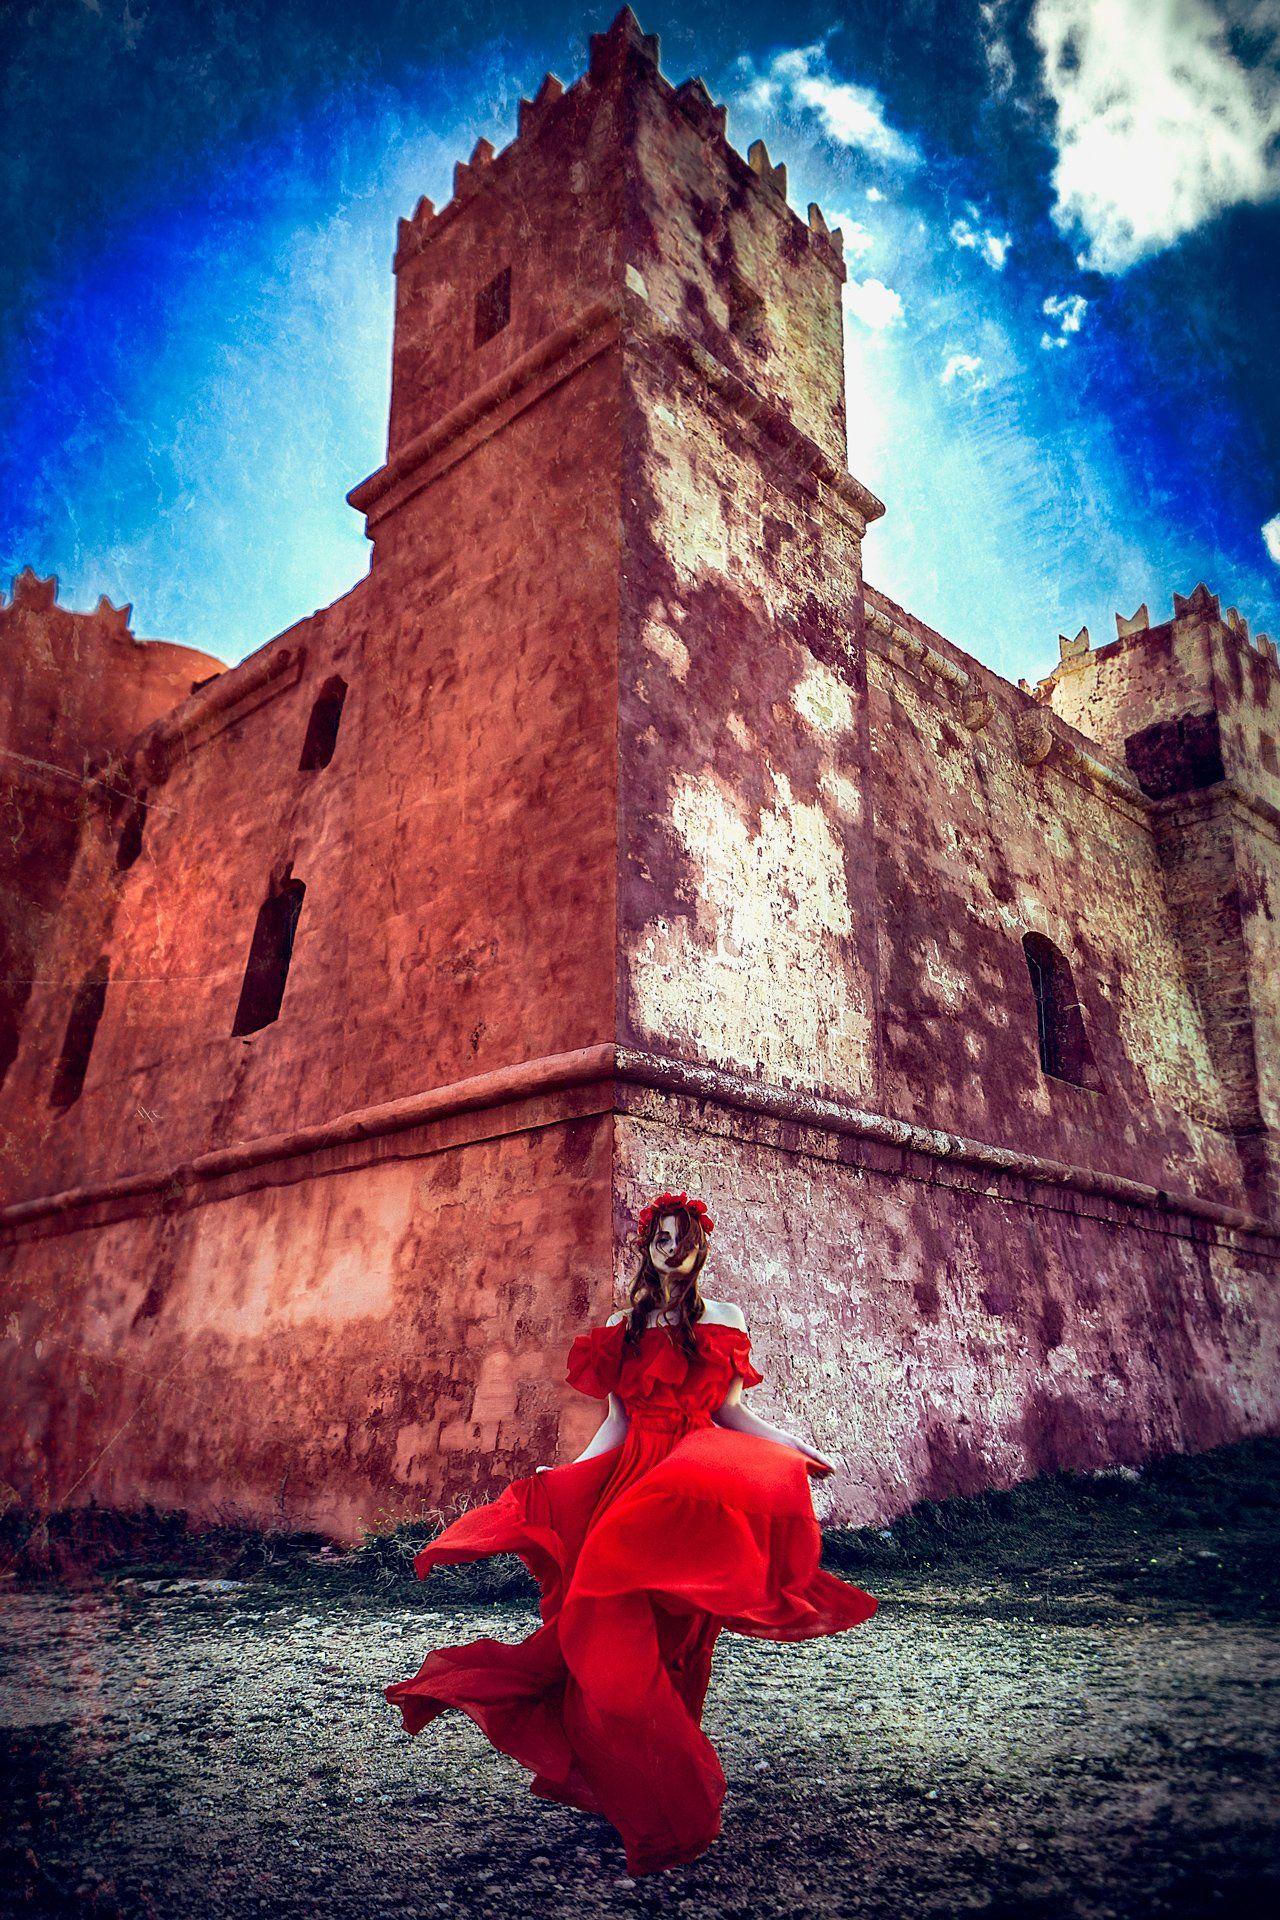 womna, portrait, red dress, red castle, malta, Руслан Болгов (Axe)